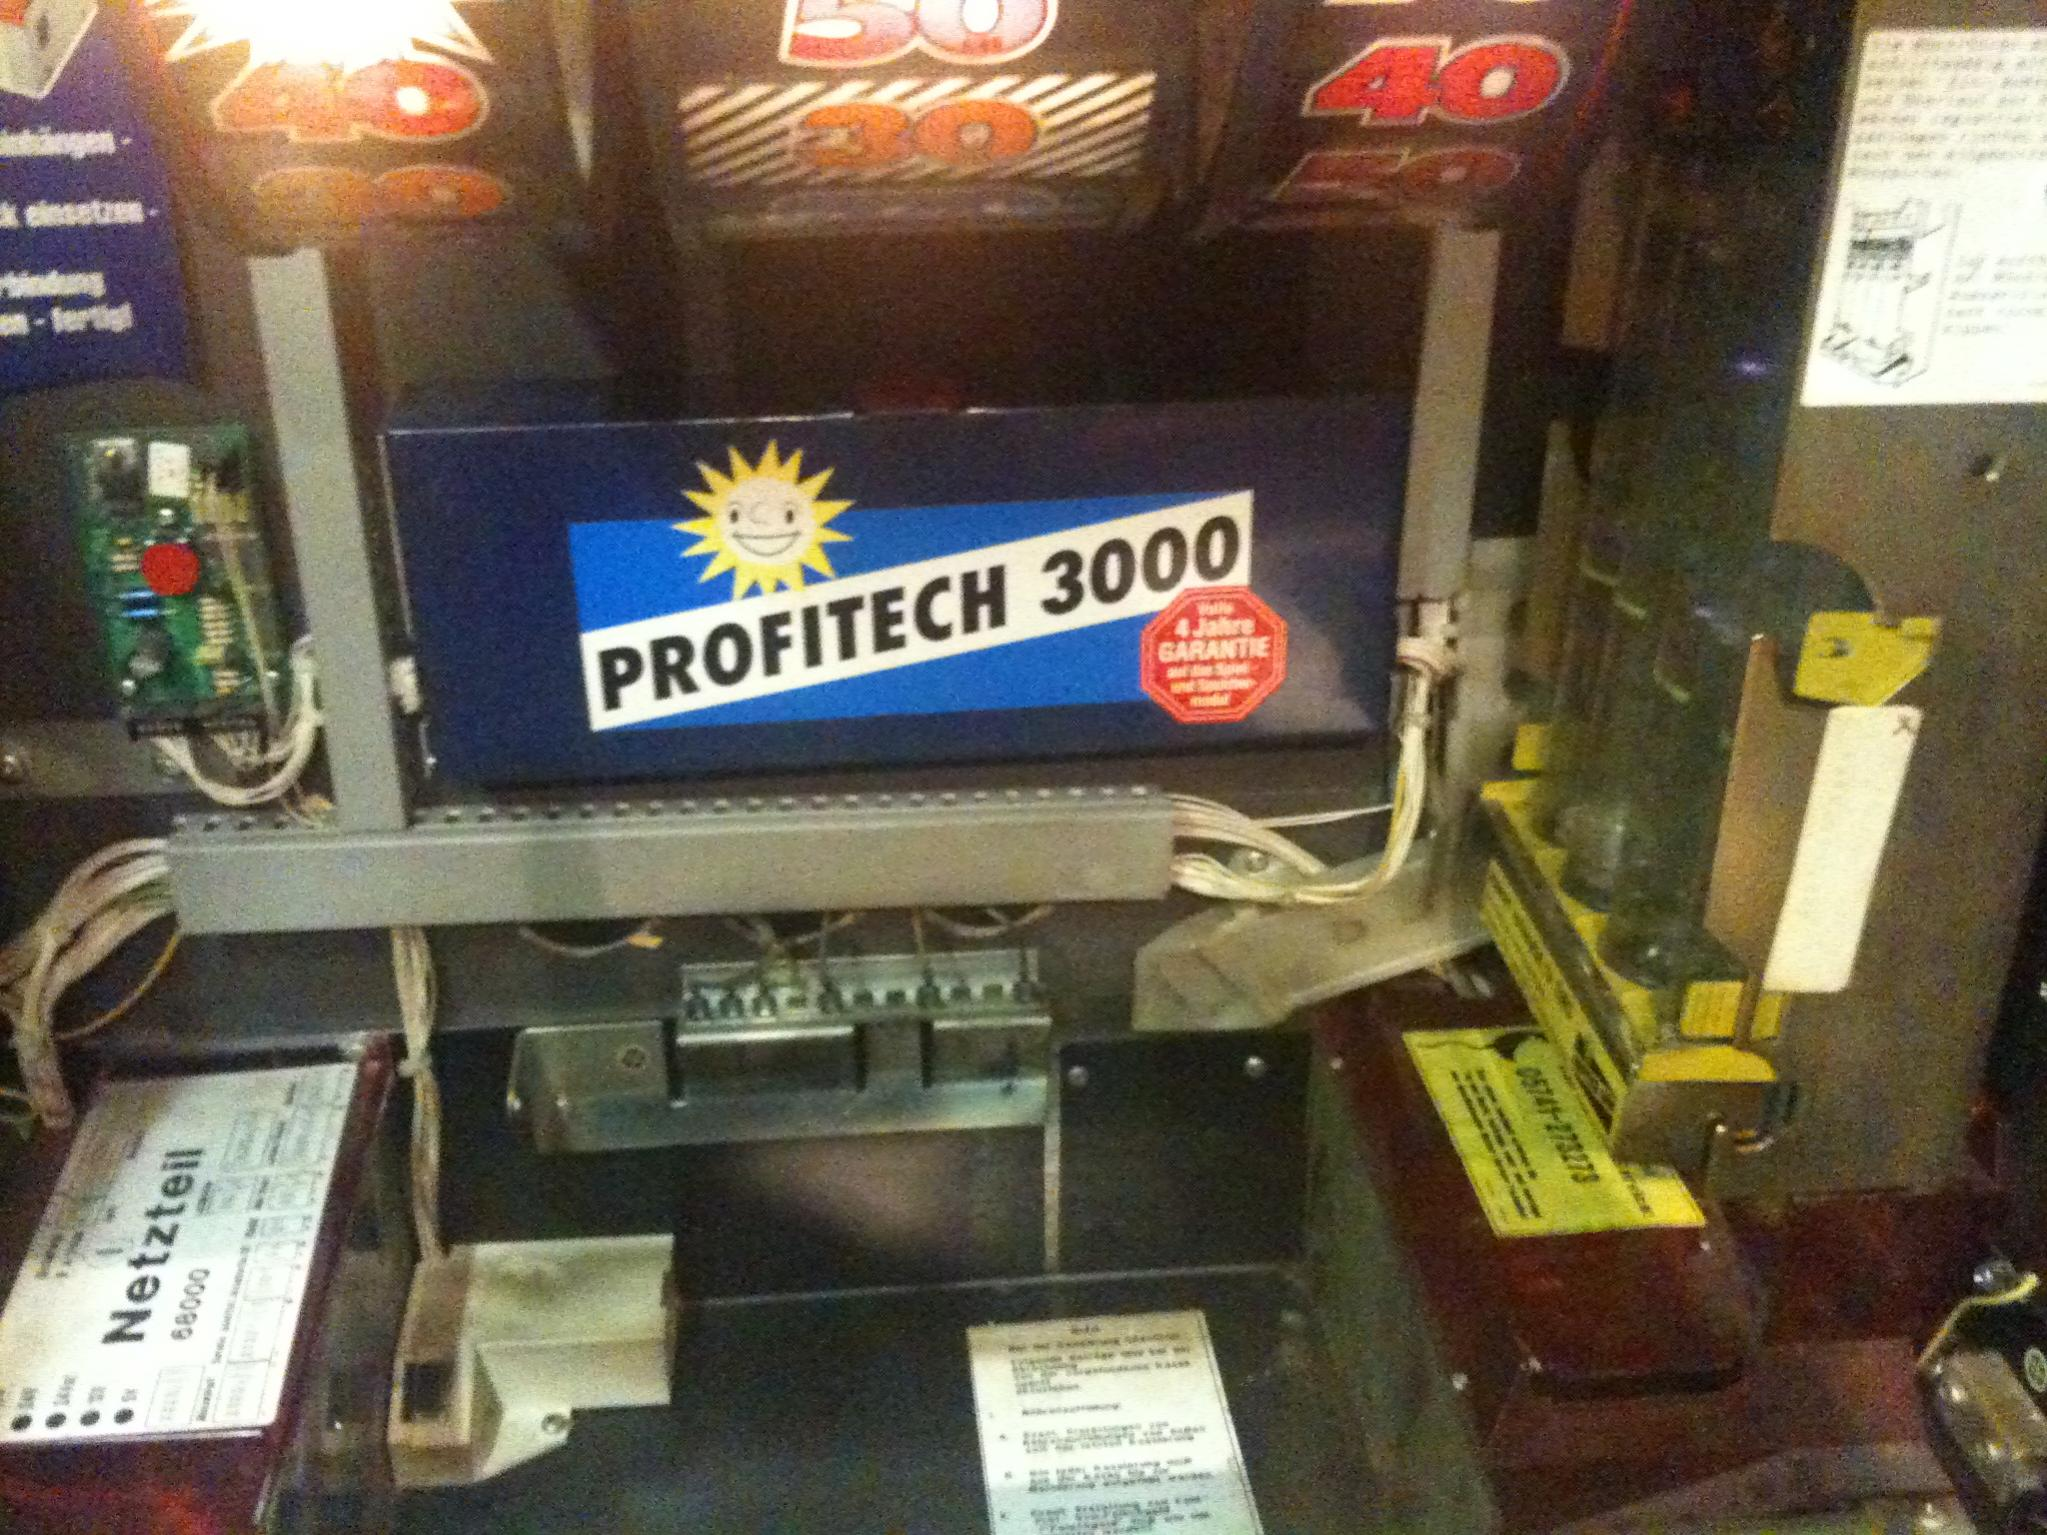 profitech 3000